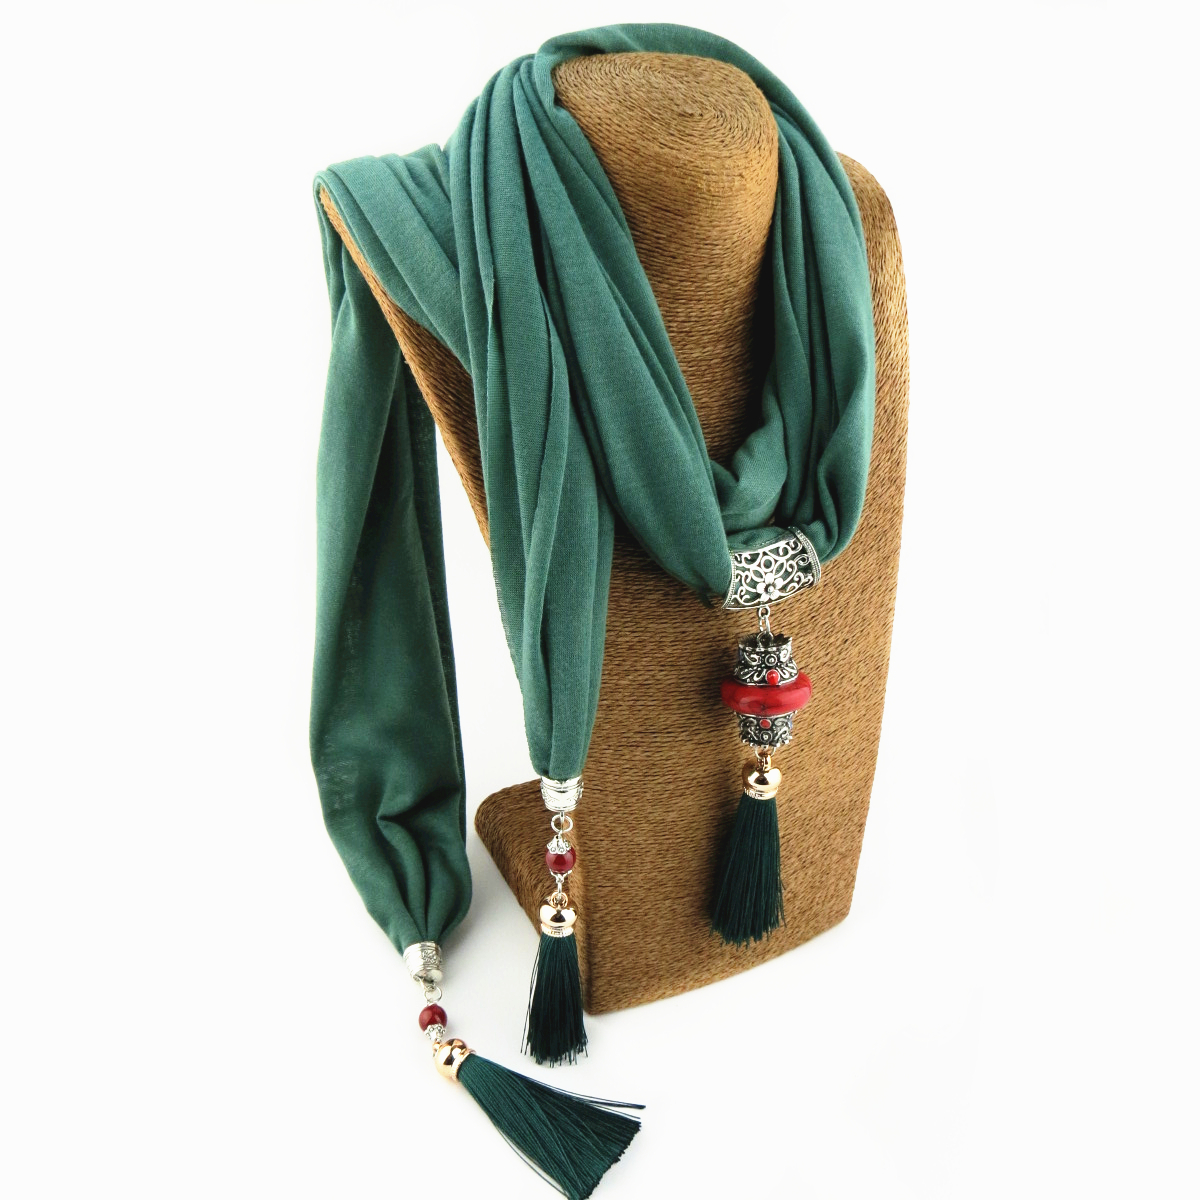 Pure Color Multi-color Fashion Tassel Design Scarf Jewelry Necklace Pendant Women's Scarf Free Shipping